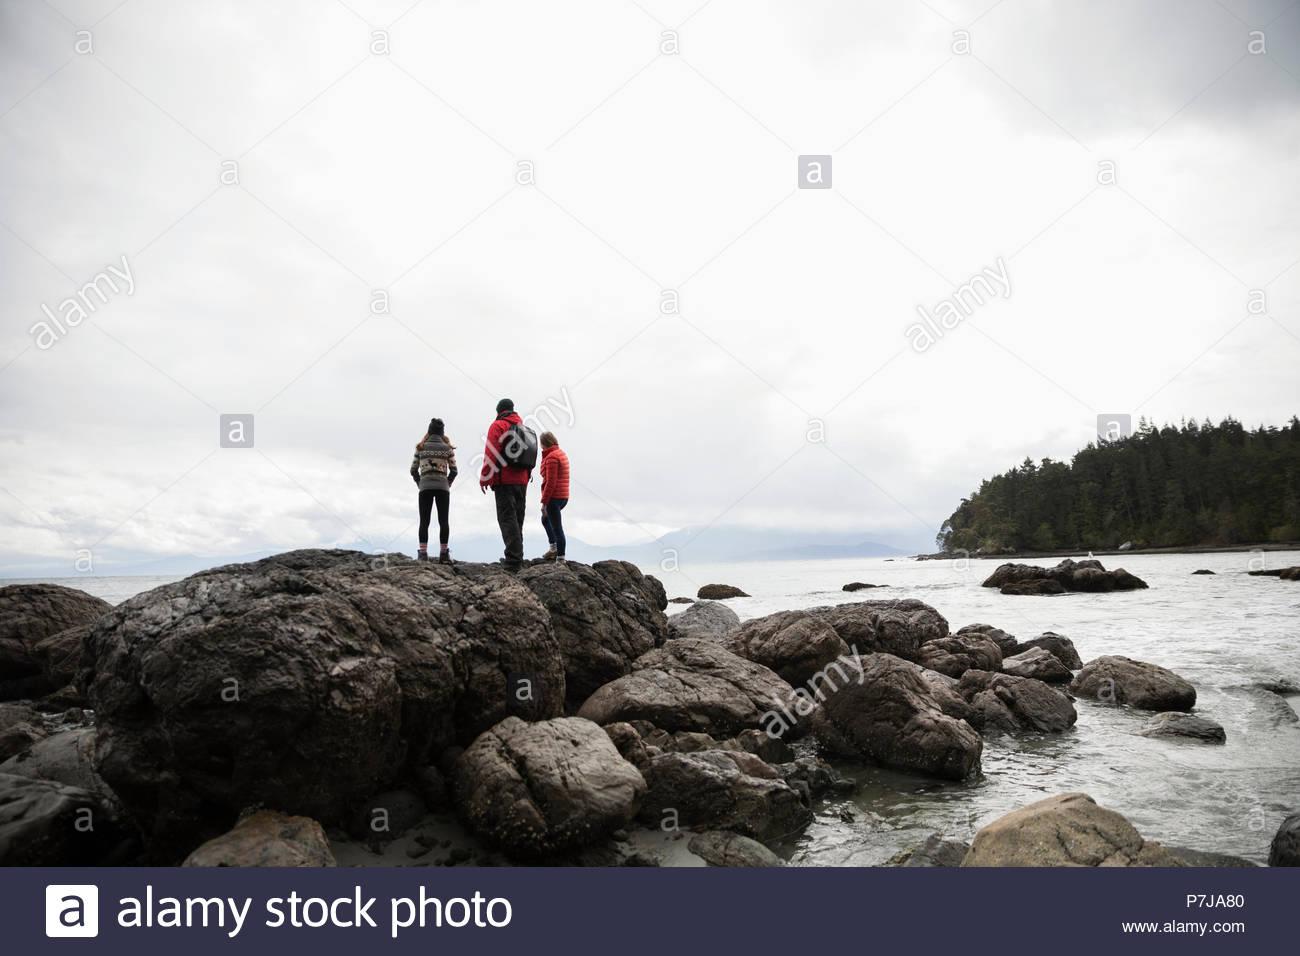 Family on rocks enjoying rugged ocean view - Stock Image